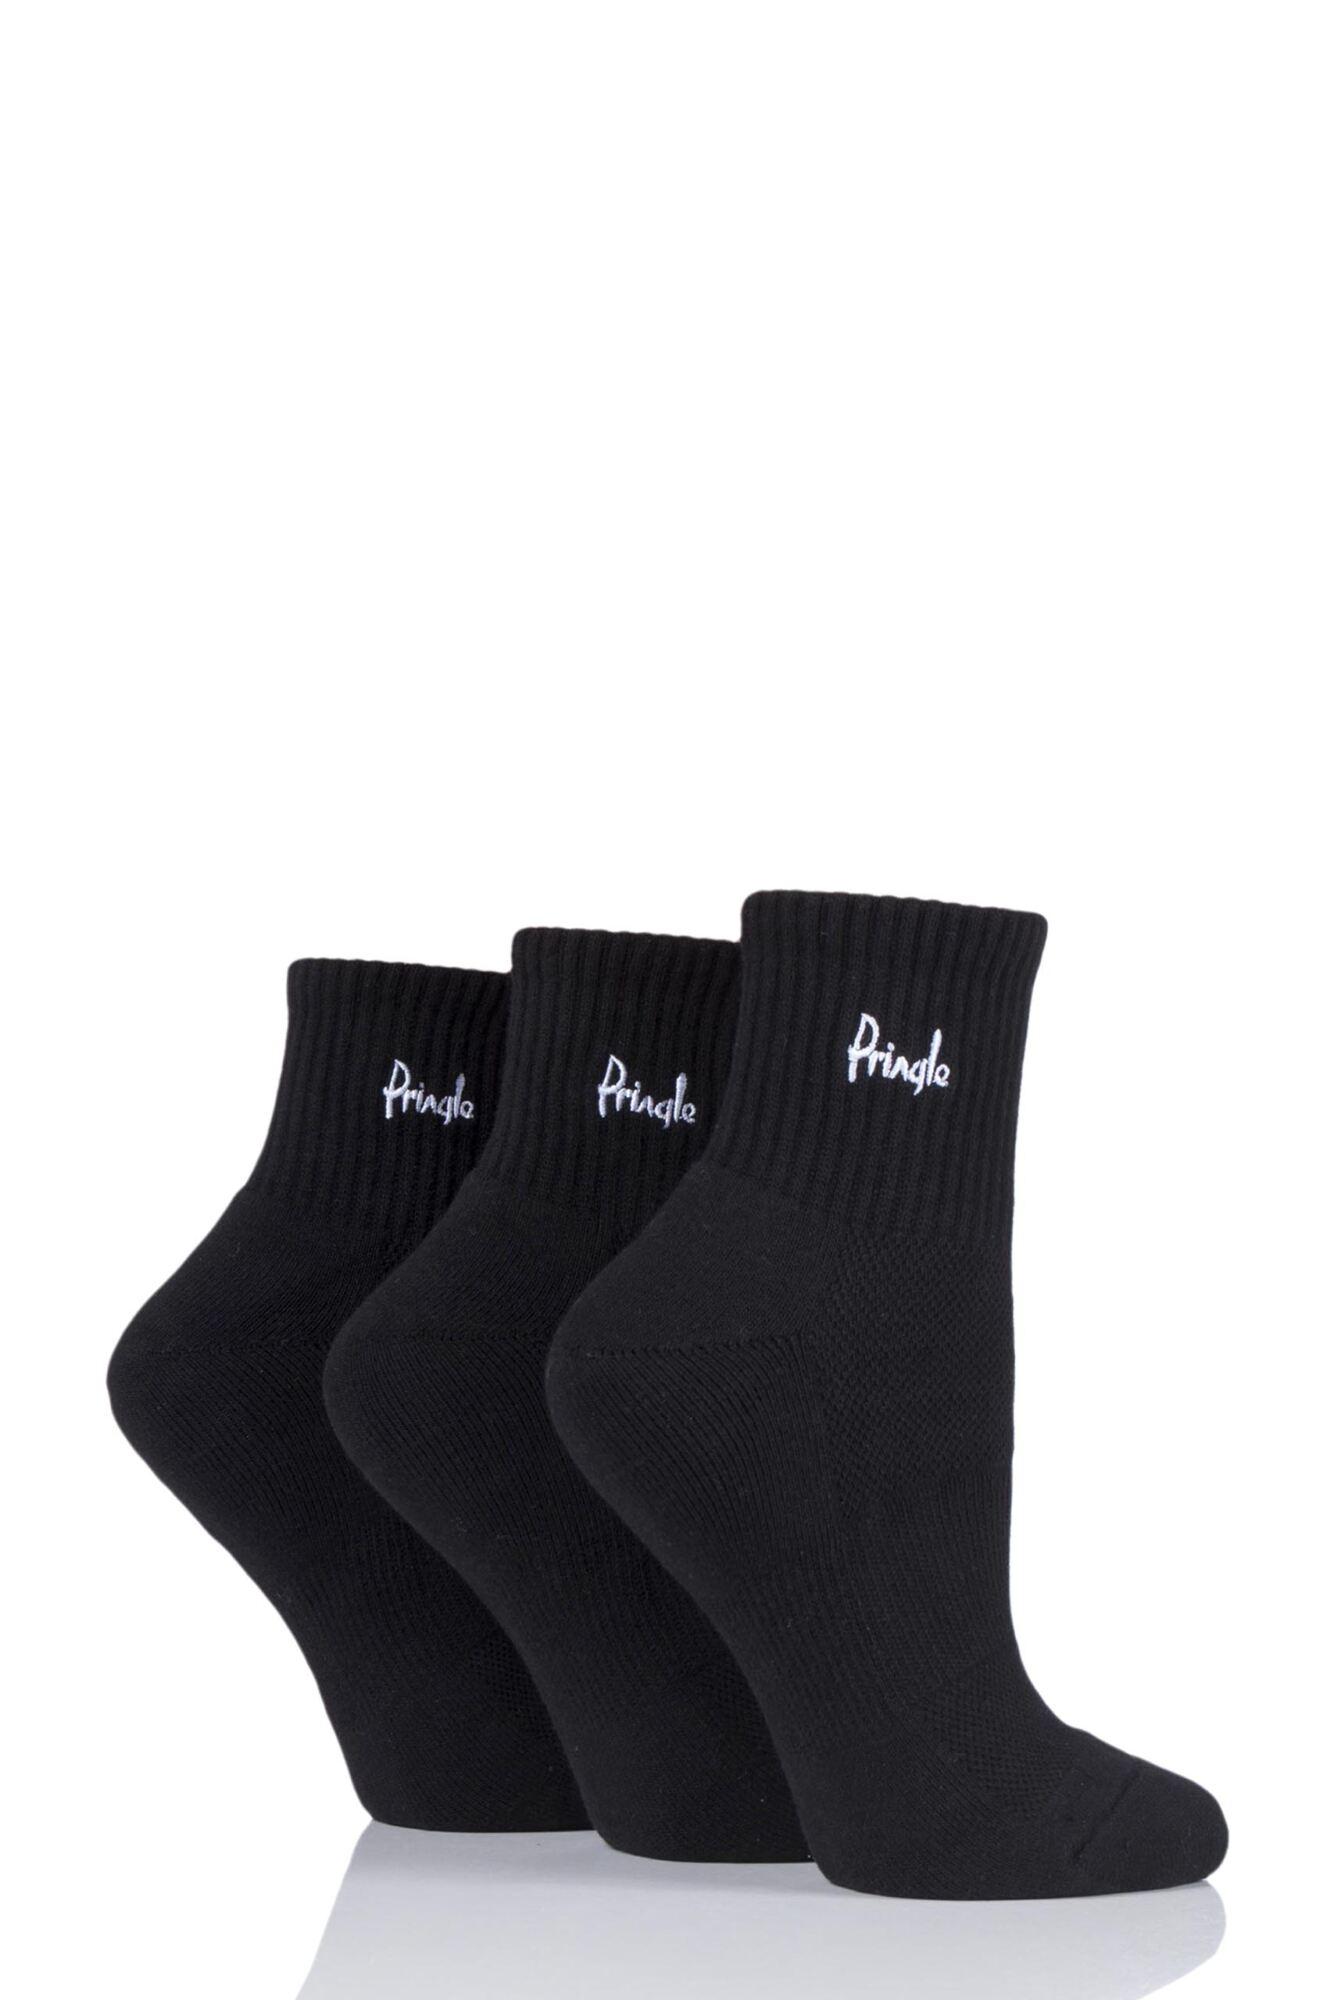 Ladies 3 Pair Pringle Lyndsey Cushioned Sport Socks